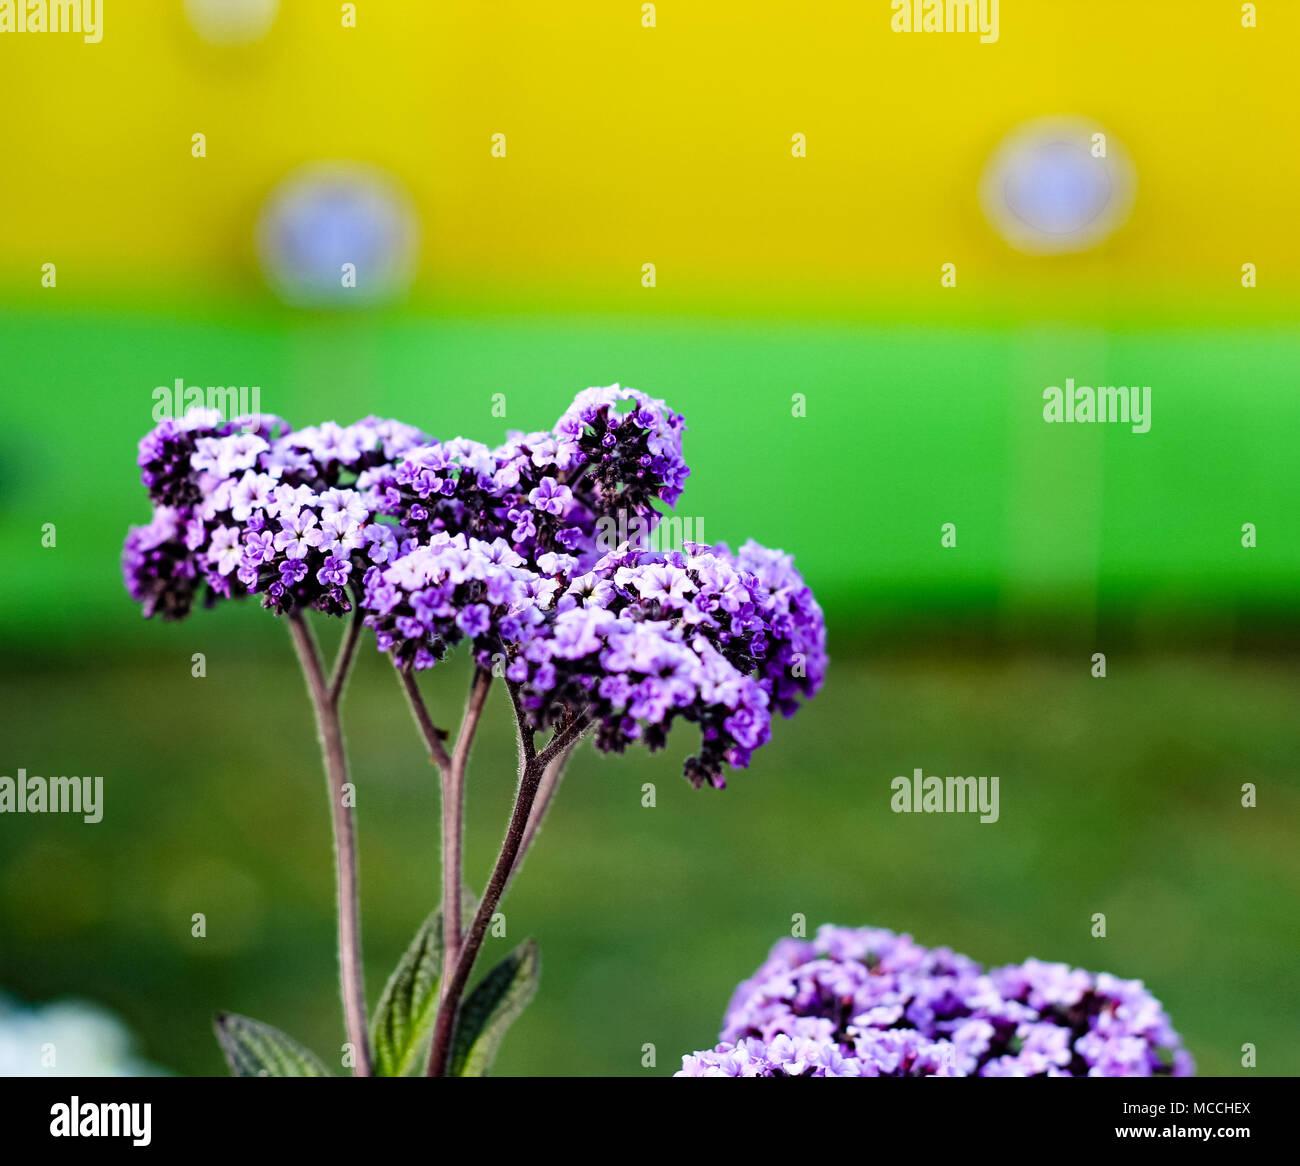 violet Buddleja or Buddleia butterfly bush flower shalow depth of field - Stock Image